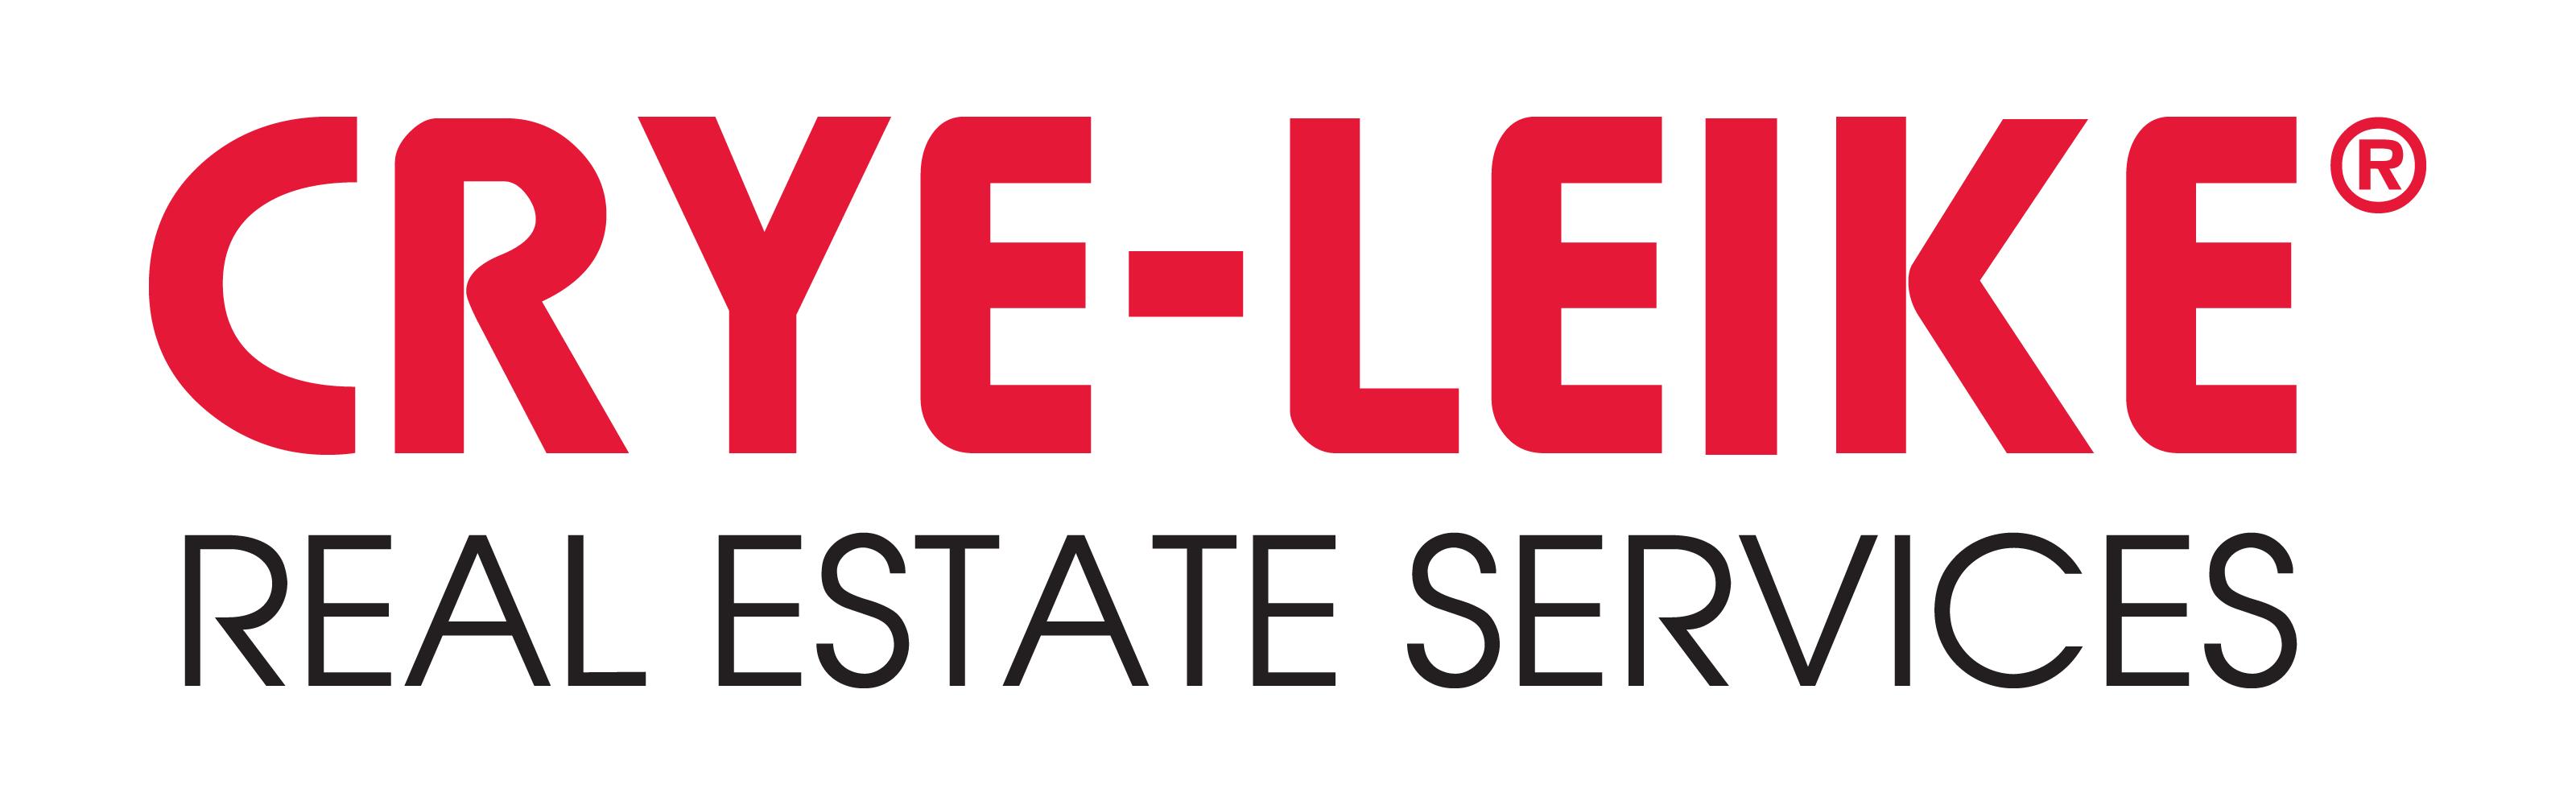 crye leike logo